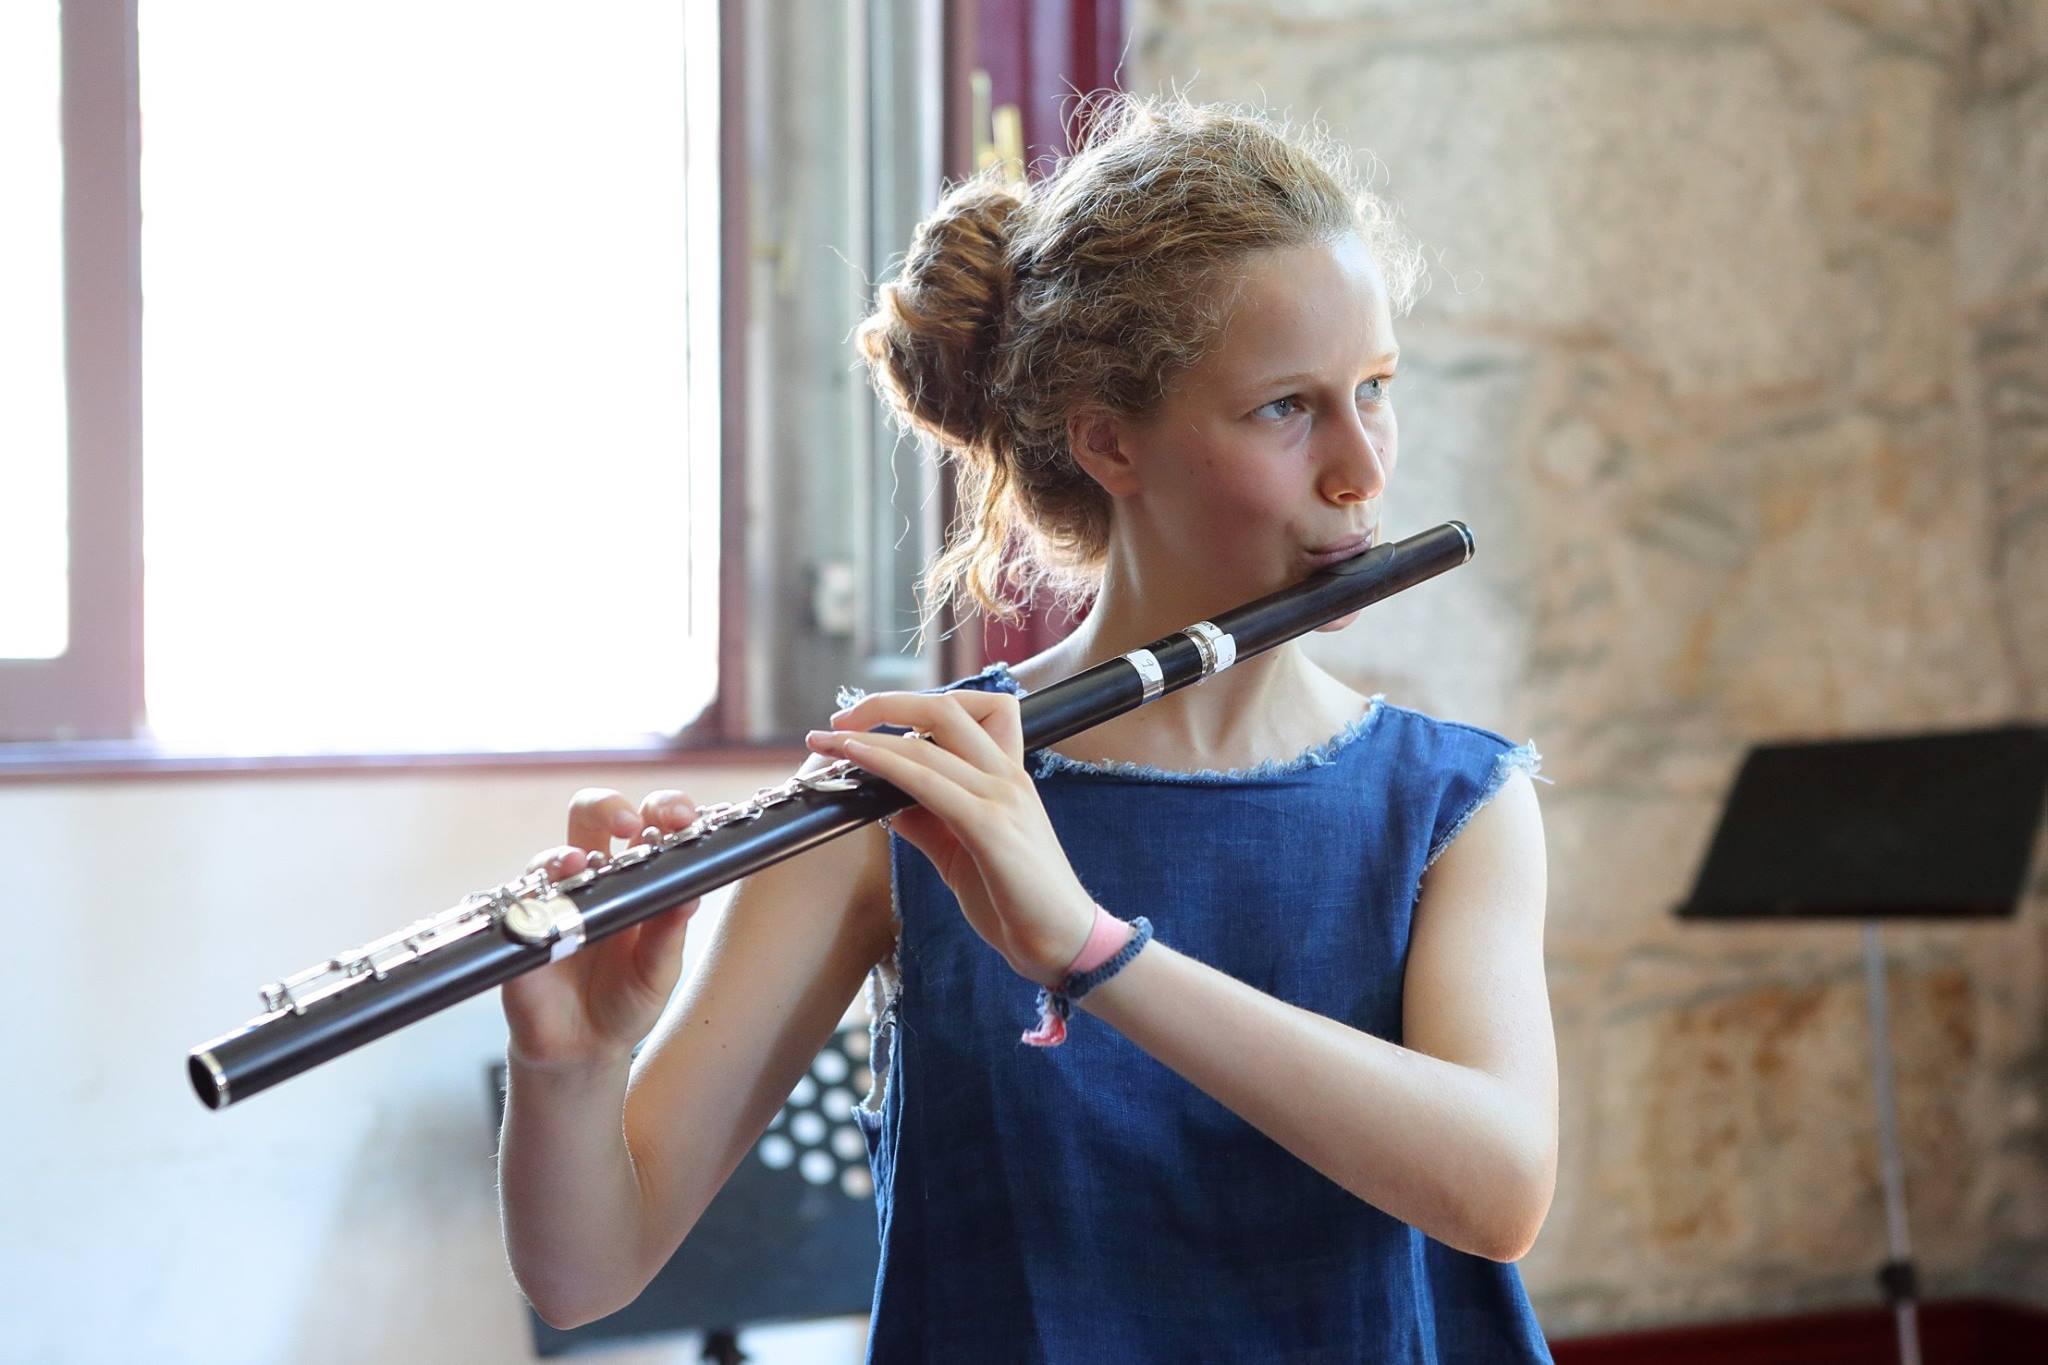 Leonor Moreira playing a Custom Handmade Powell flute in Grenadilla, Photo © Susana Neves/AFV